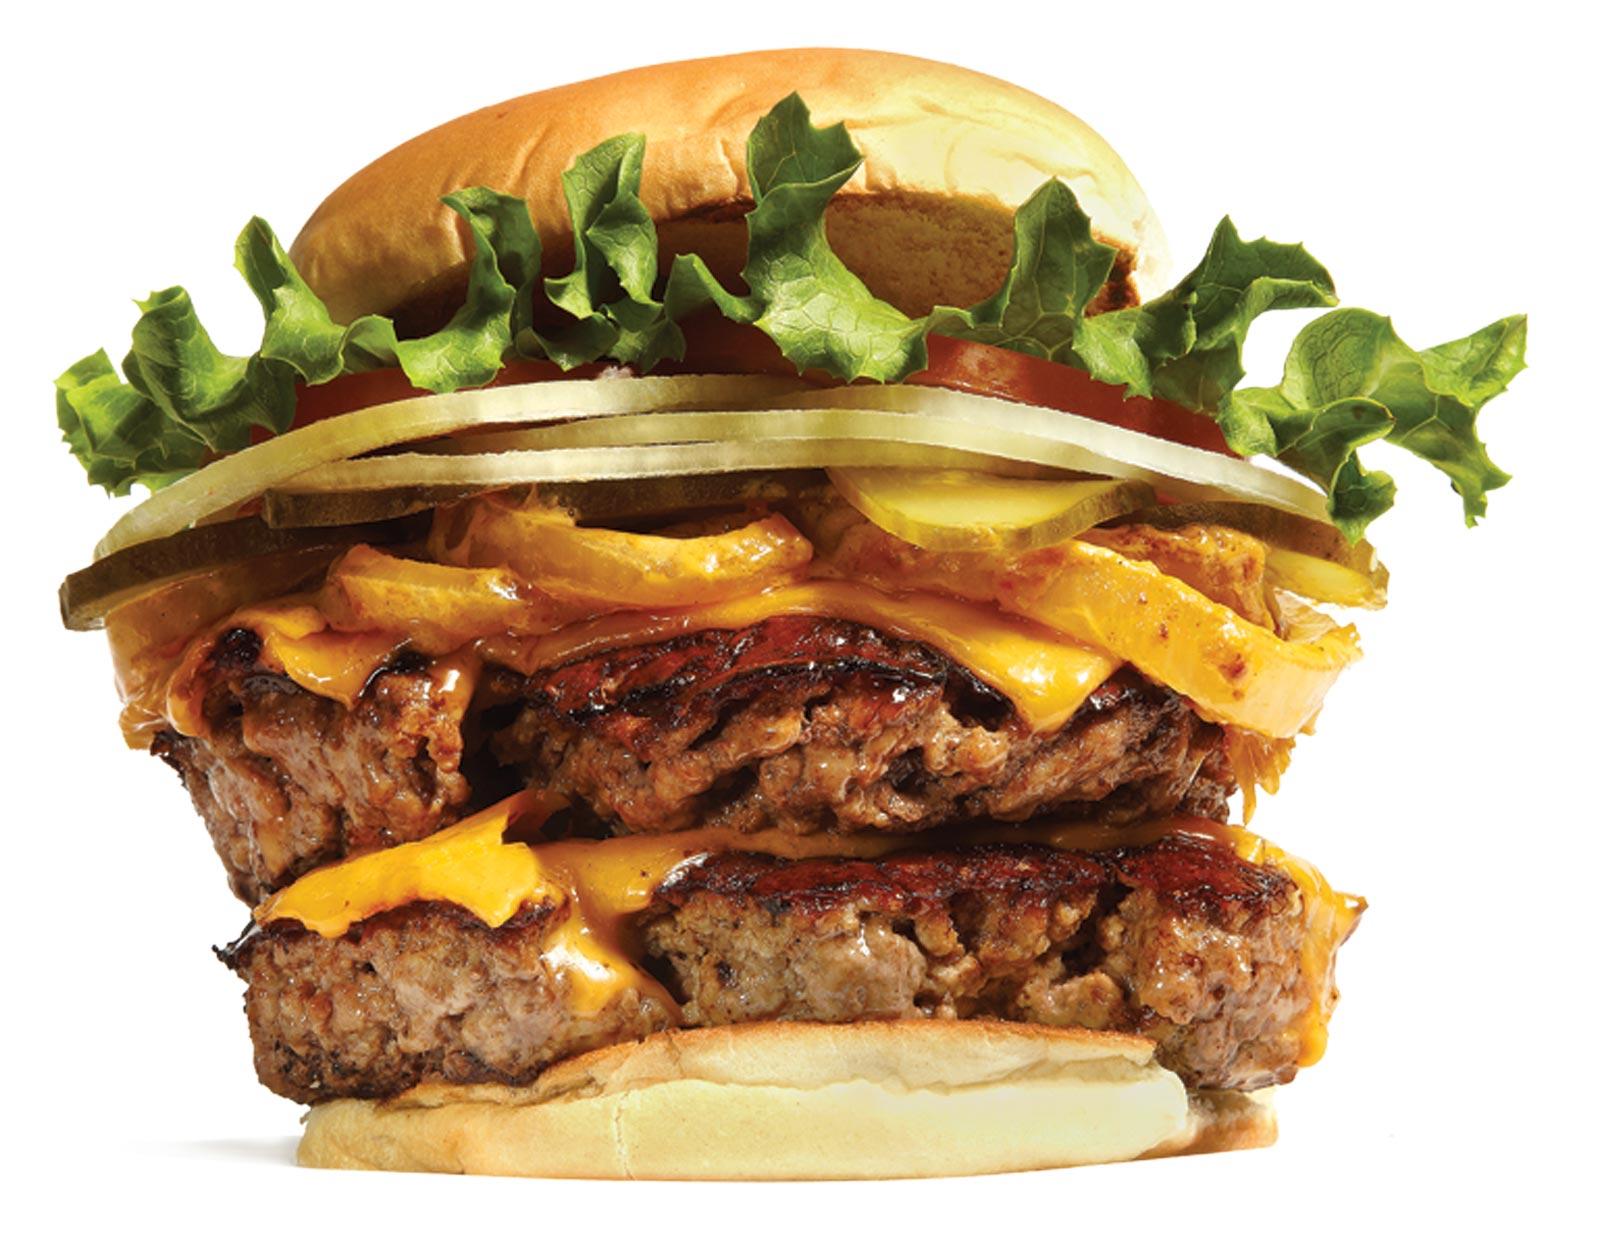 Burgers Priest